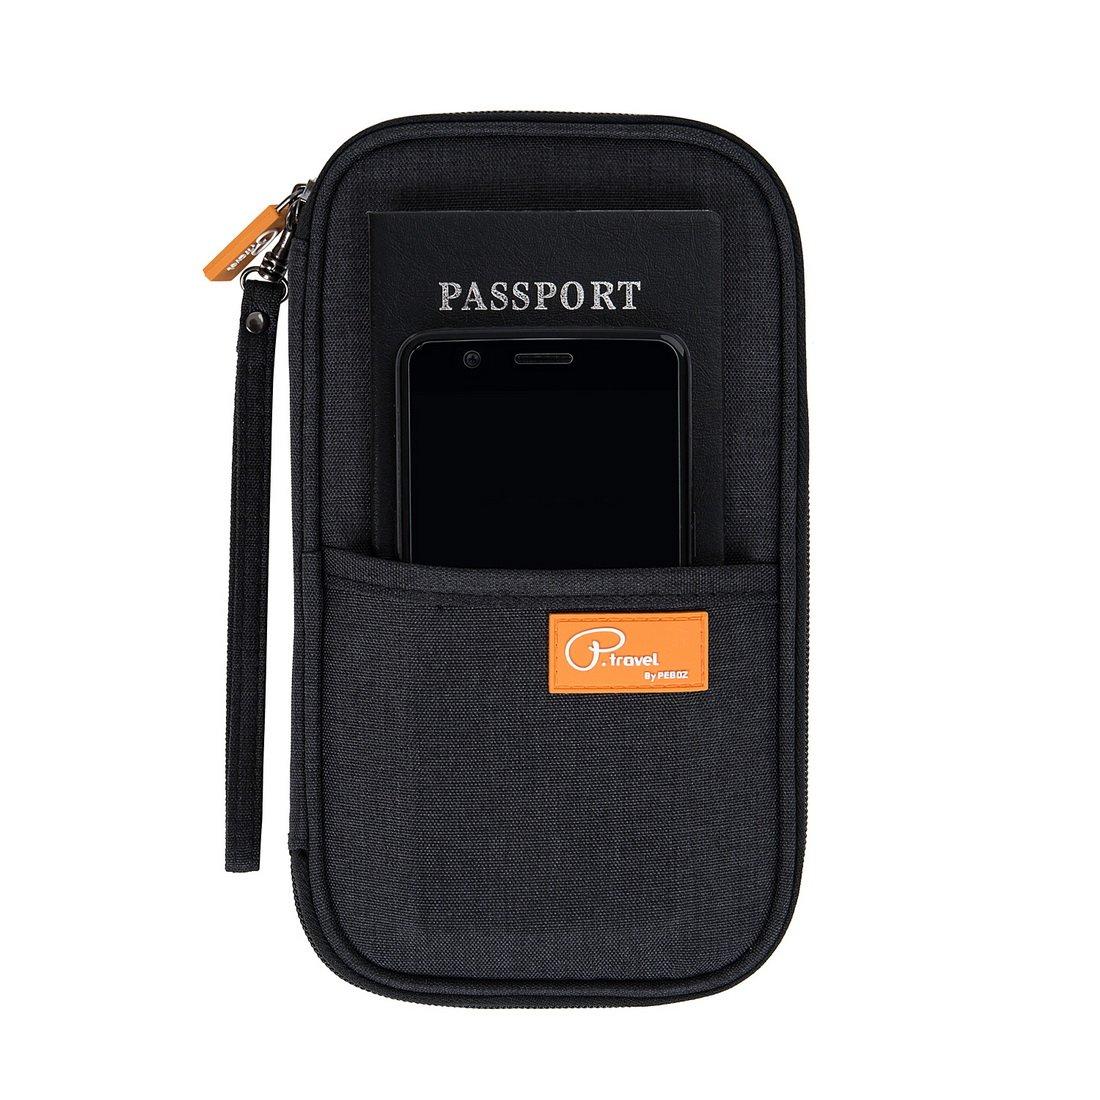 DOKEHOM DKA3202BK Travel Wallet Passport Holder Cover (3 Colors), RFID Document Organizer with Hand Strap (Black, M)